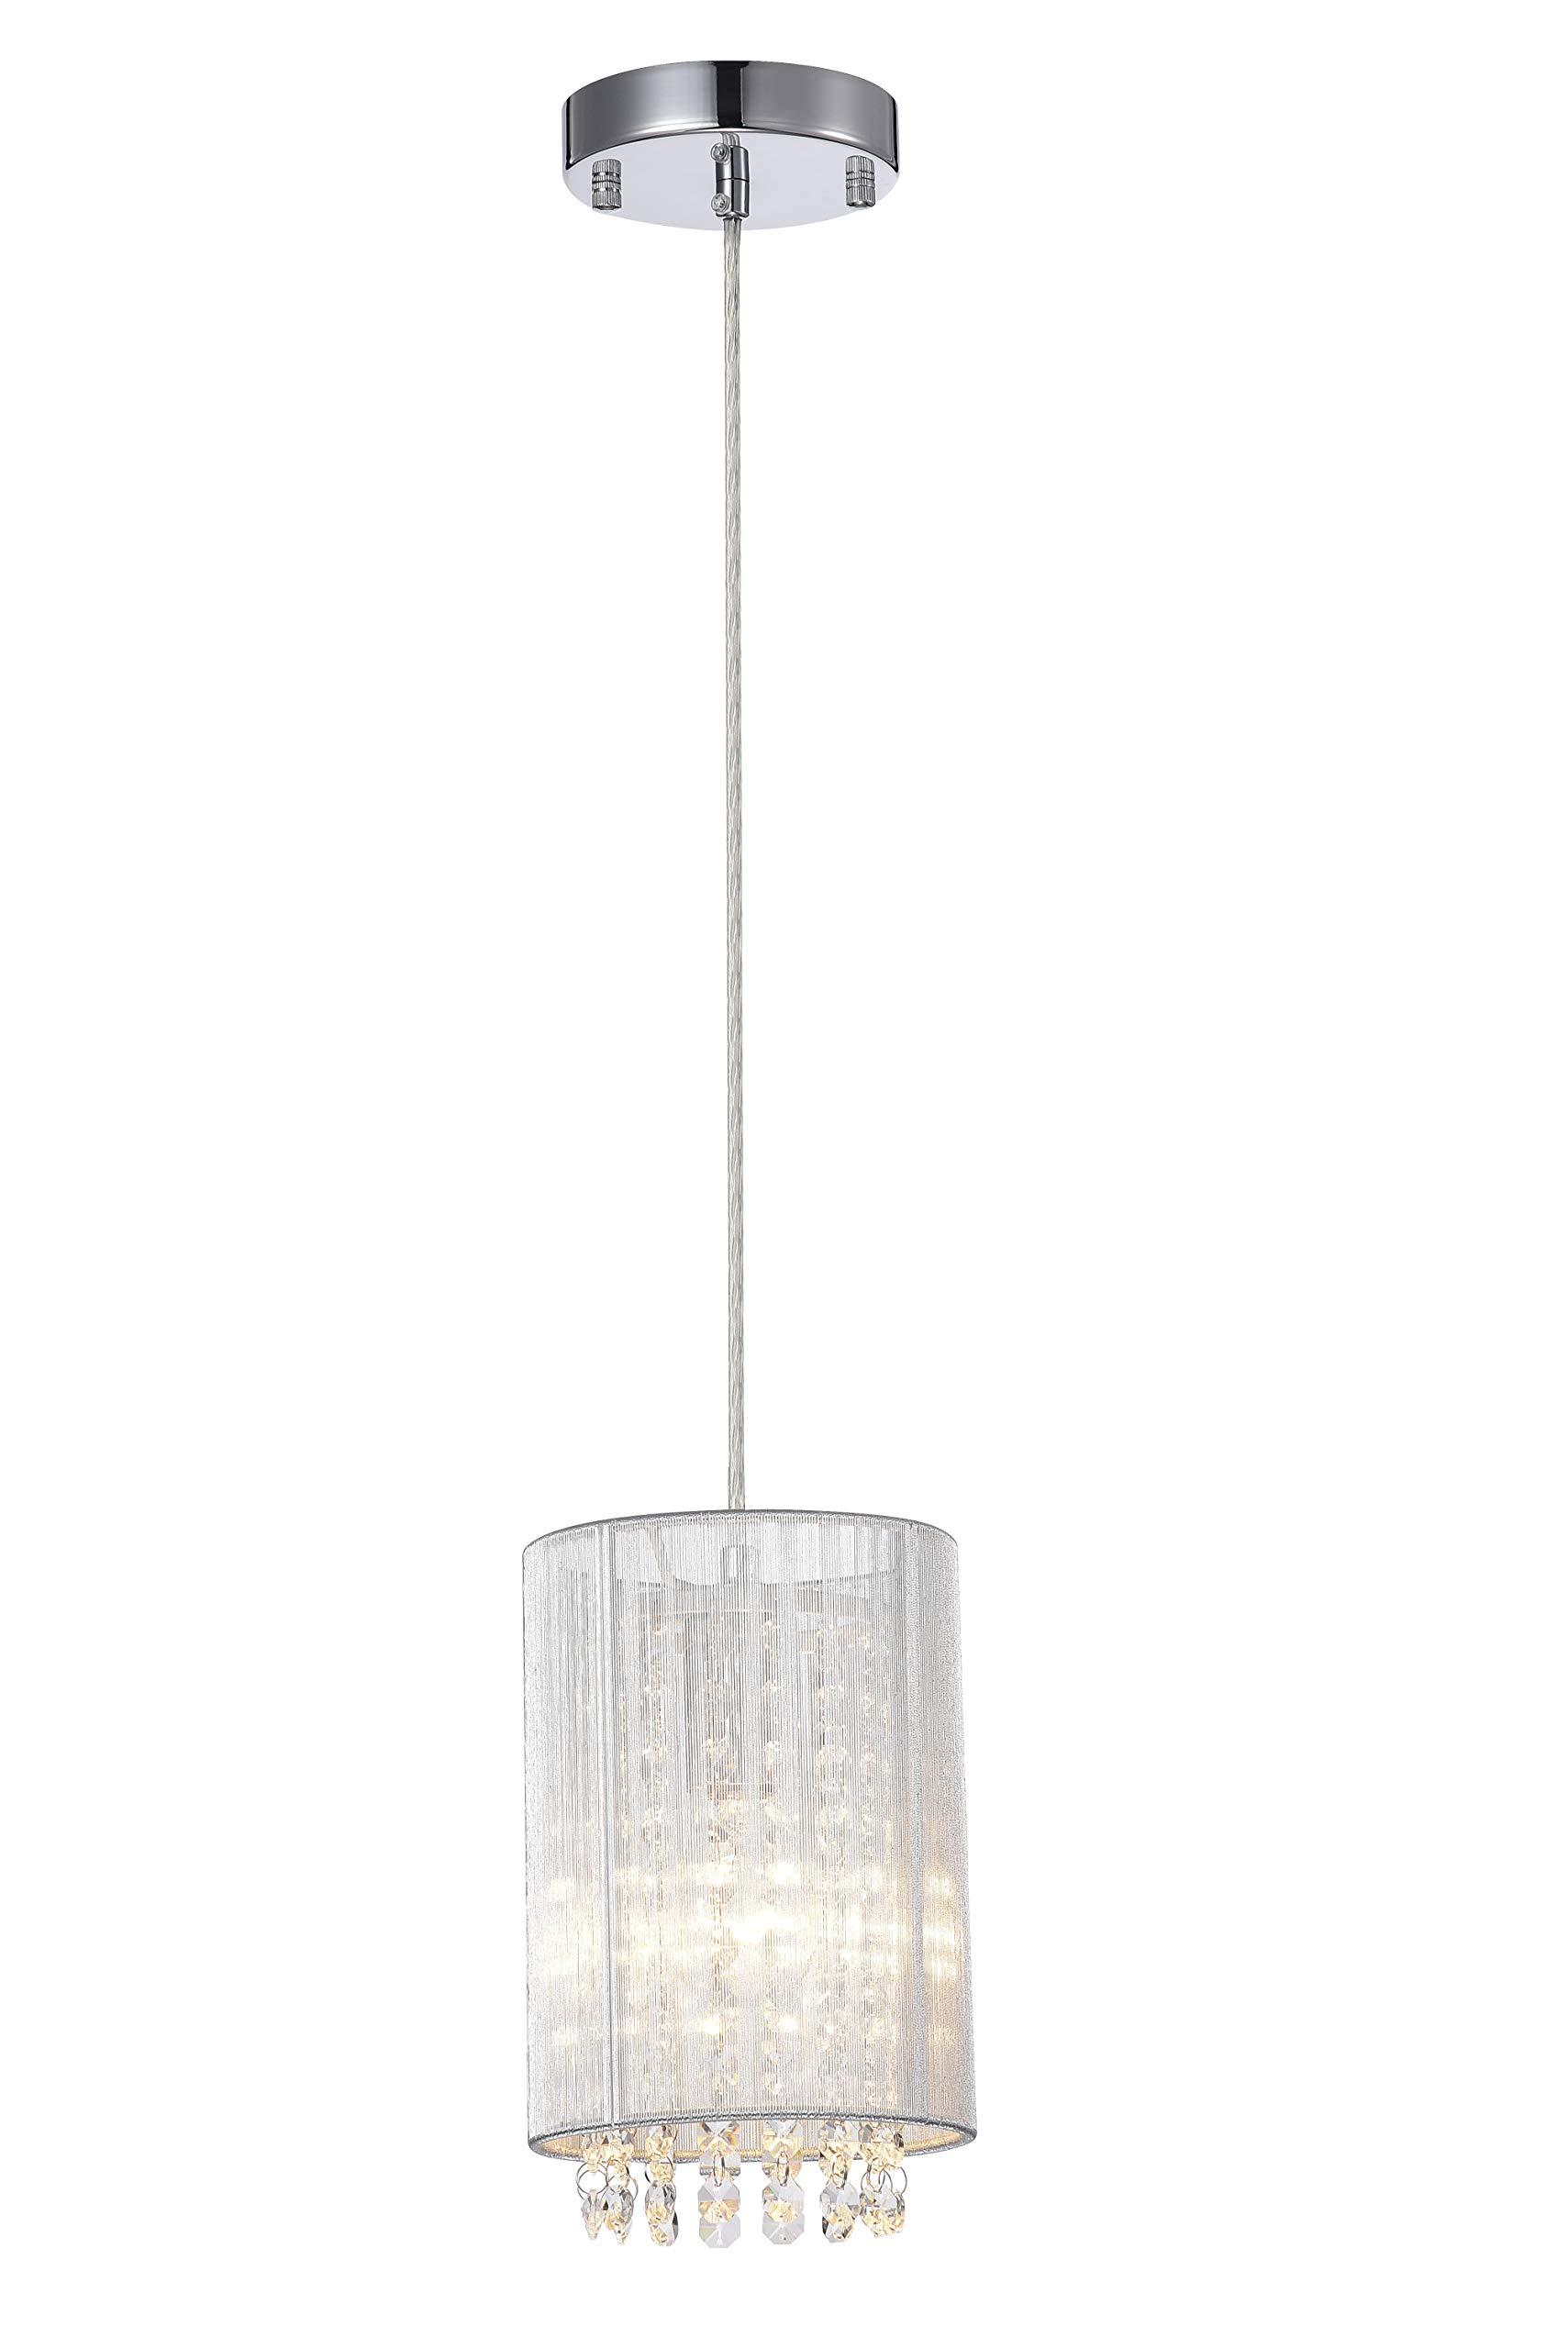 LaLuLa Pendant Lighting Mini Pendant Light Silver Drum Crystal Chandelier 1 Light by LaLuLa (Image #1)